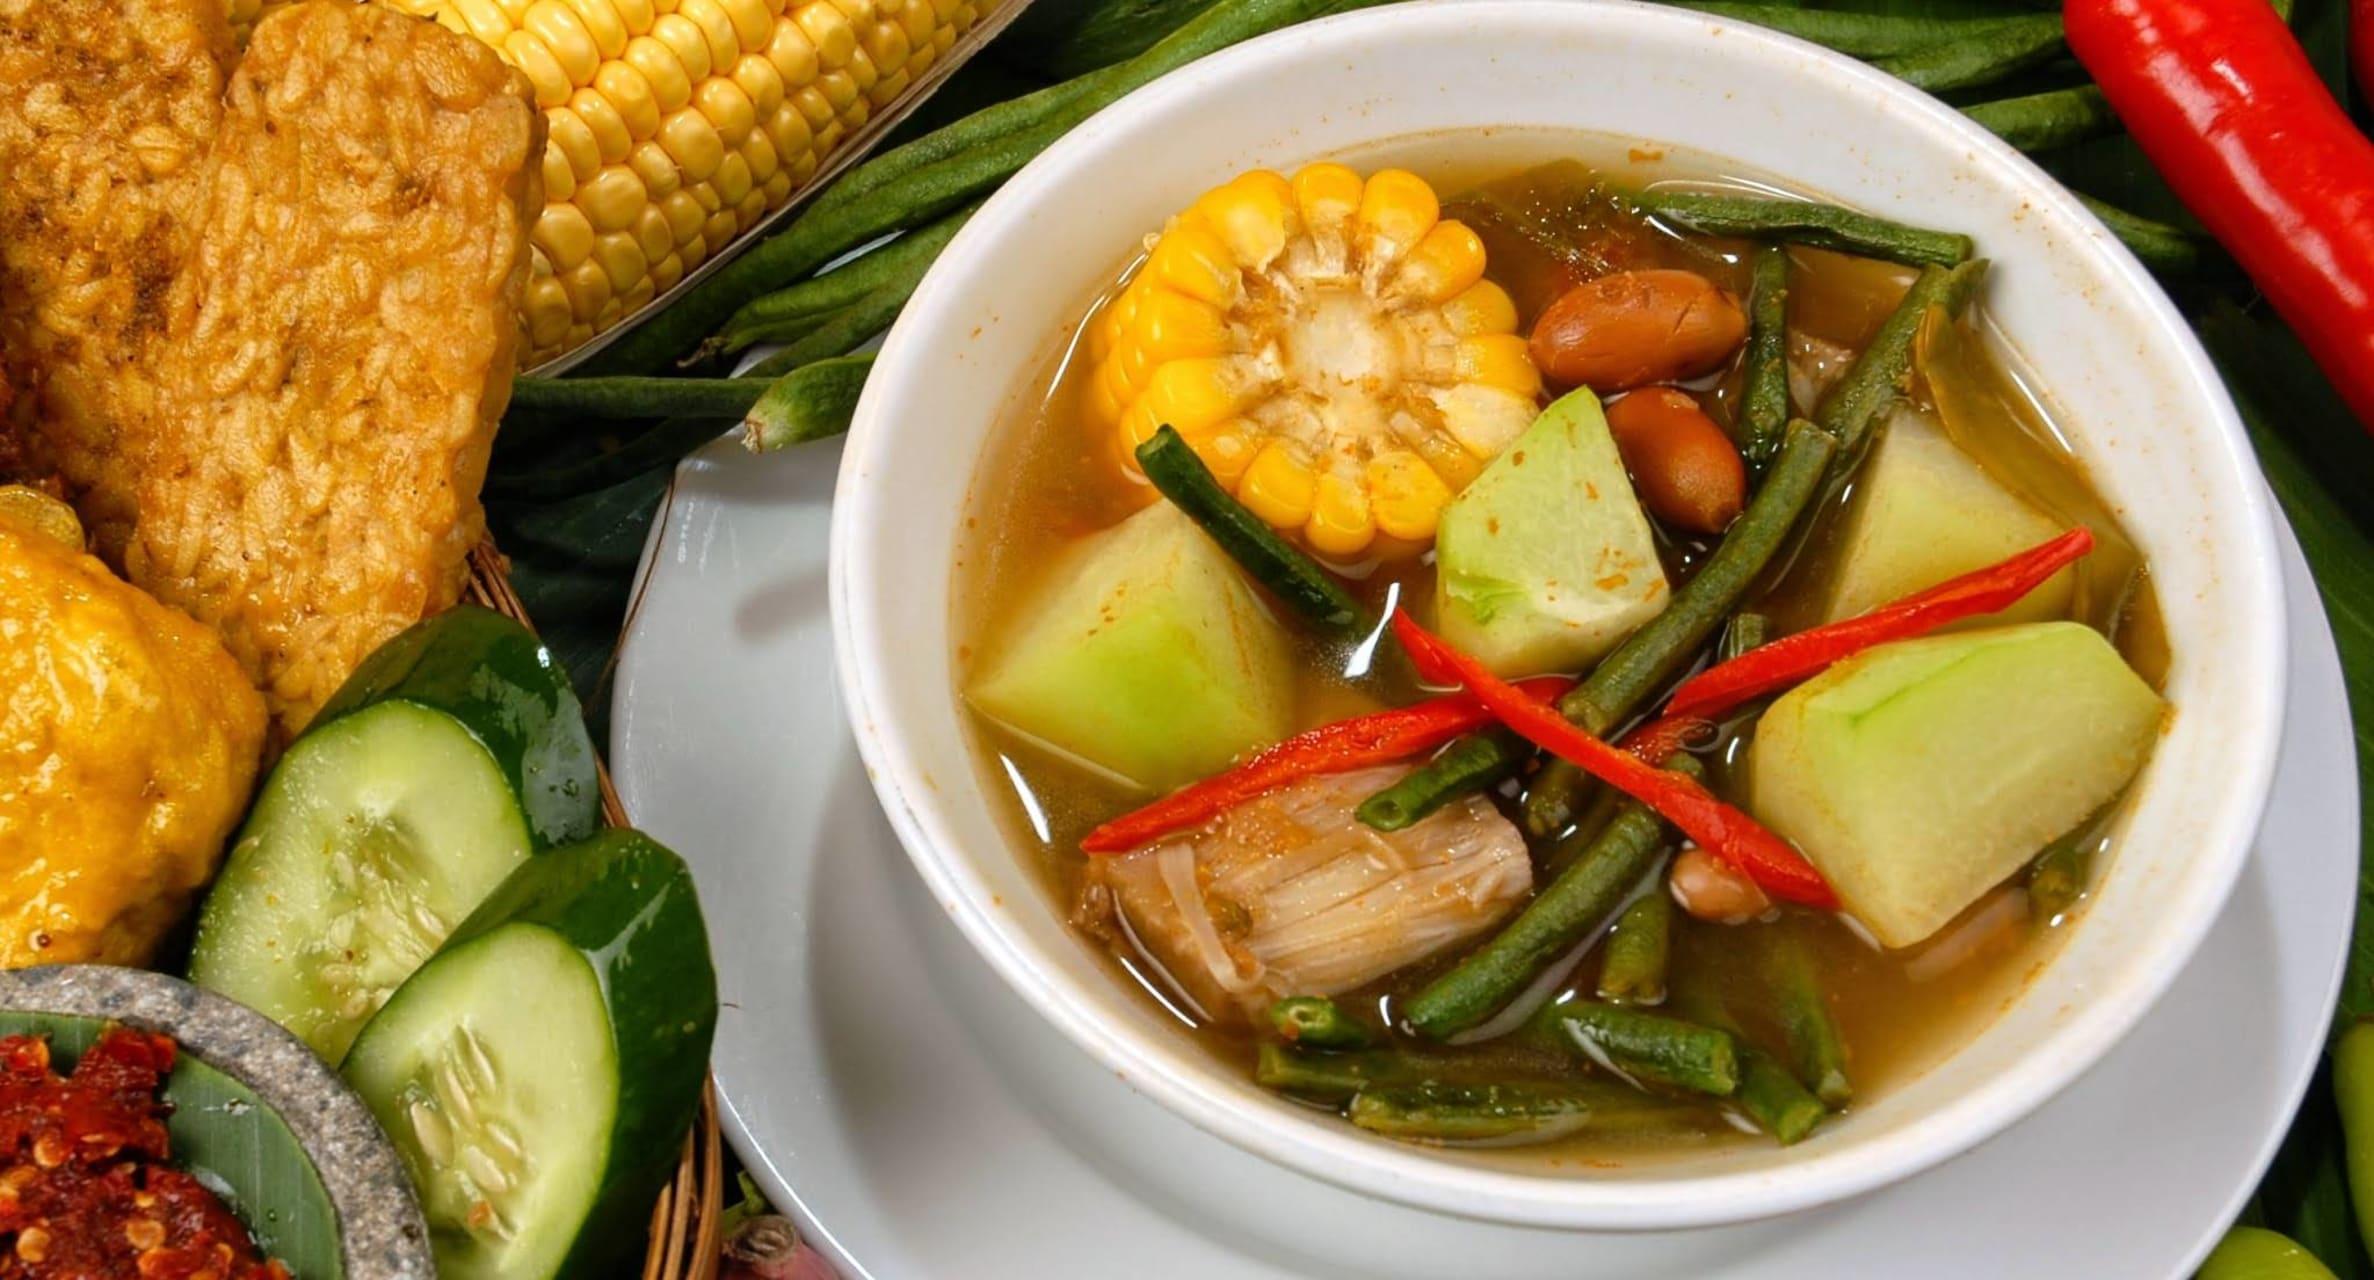 Yogyakarta - Home Cooking: Sayur Asem - Vegetables in Tamarind Soup